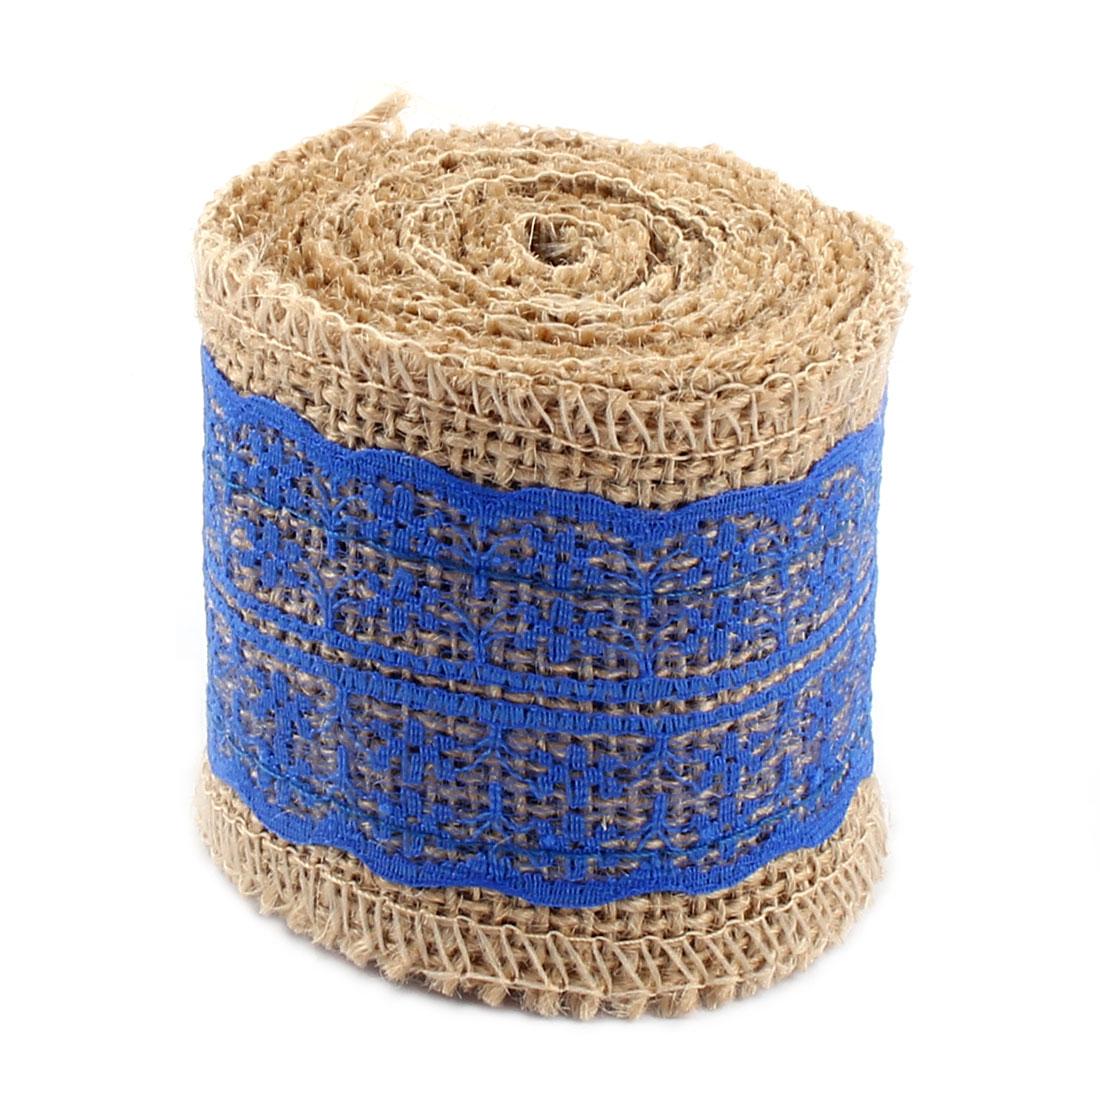 Dorm Room Decor Burlap DIY Gift Packing Belt Handcraft Ribbon Roll - image 2 de 4